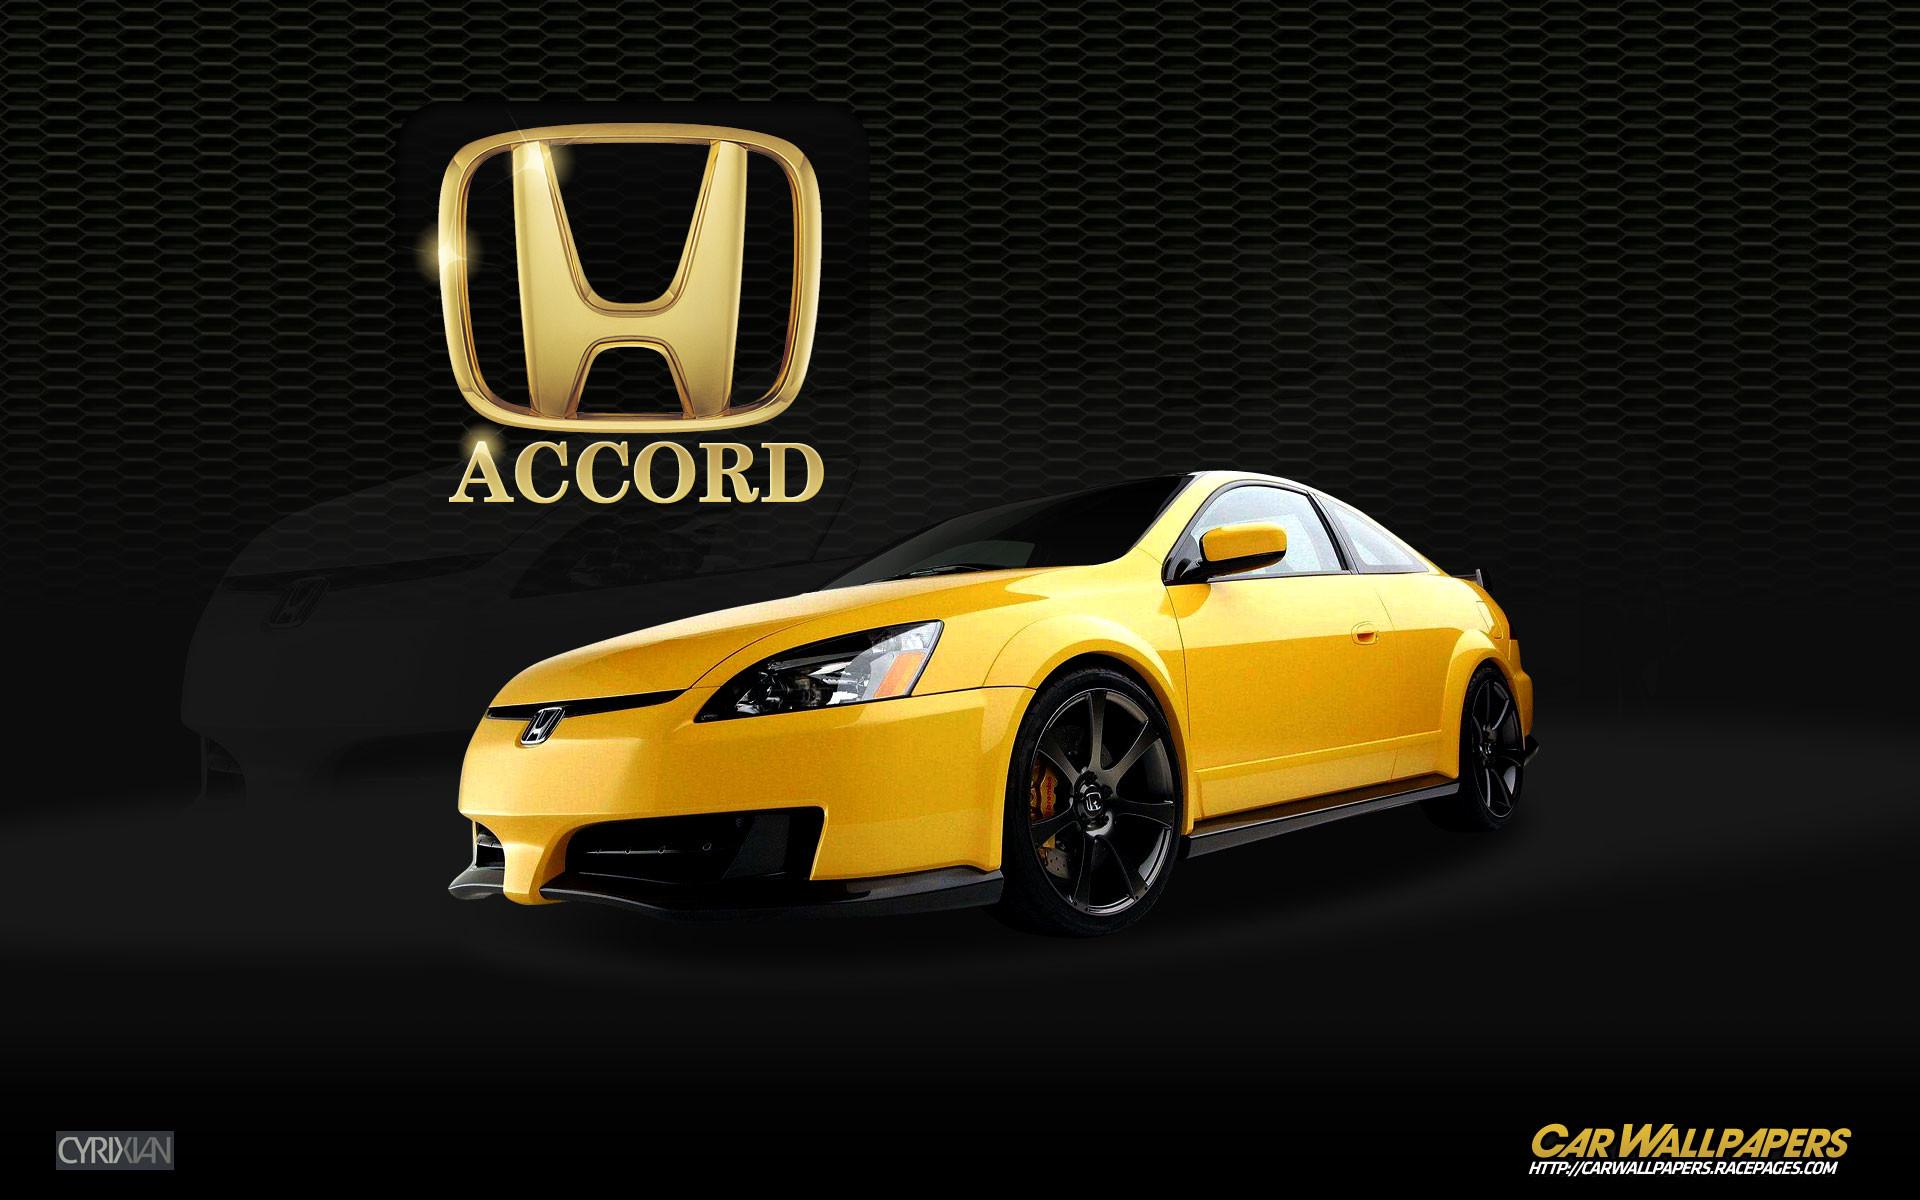 Honda Accord Wallpaper HD (58+ Images